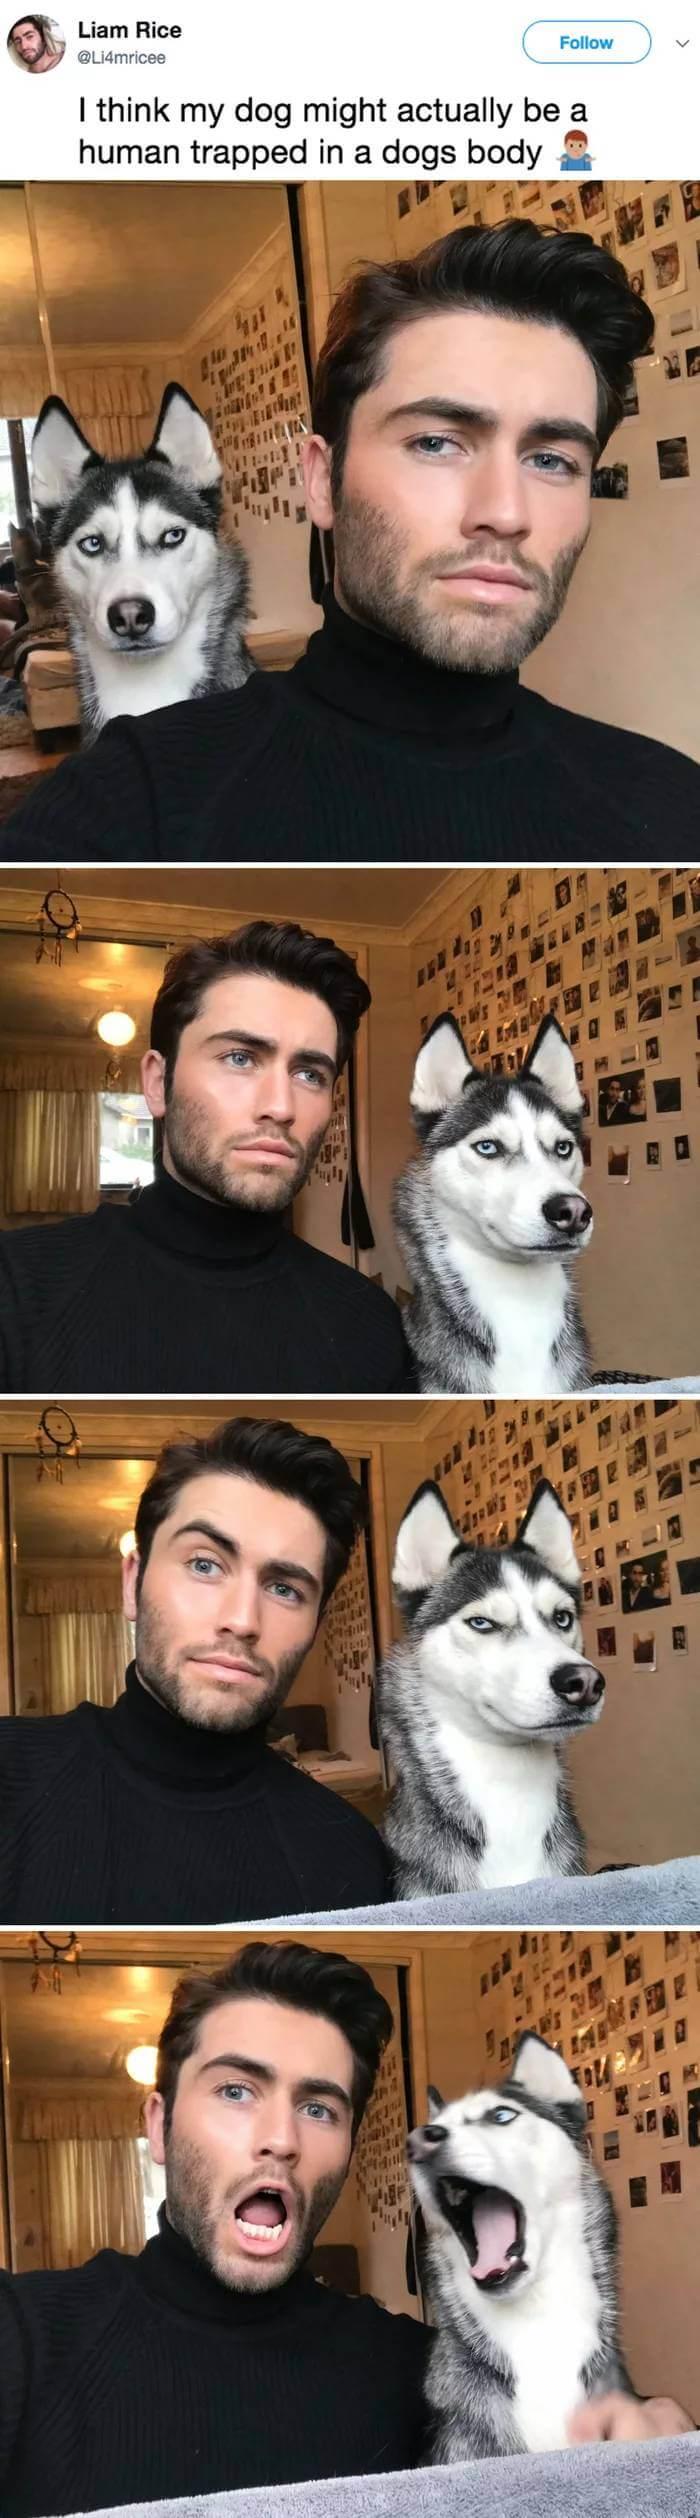 twinning trend pets 1 (1)